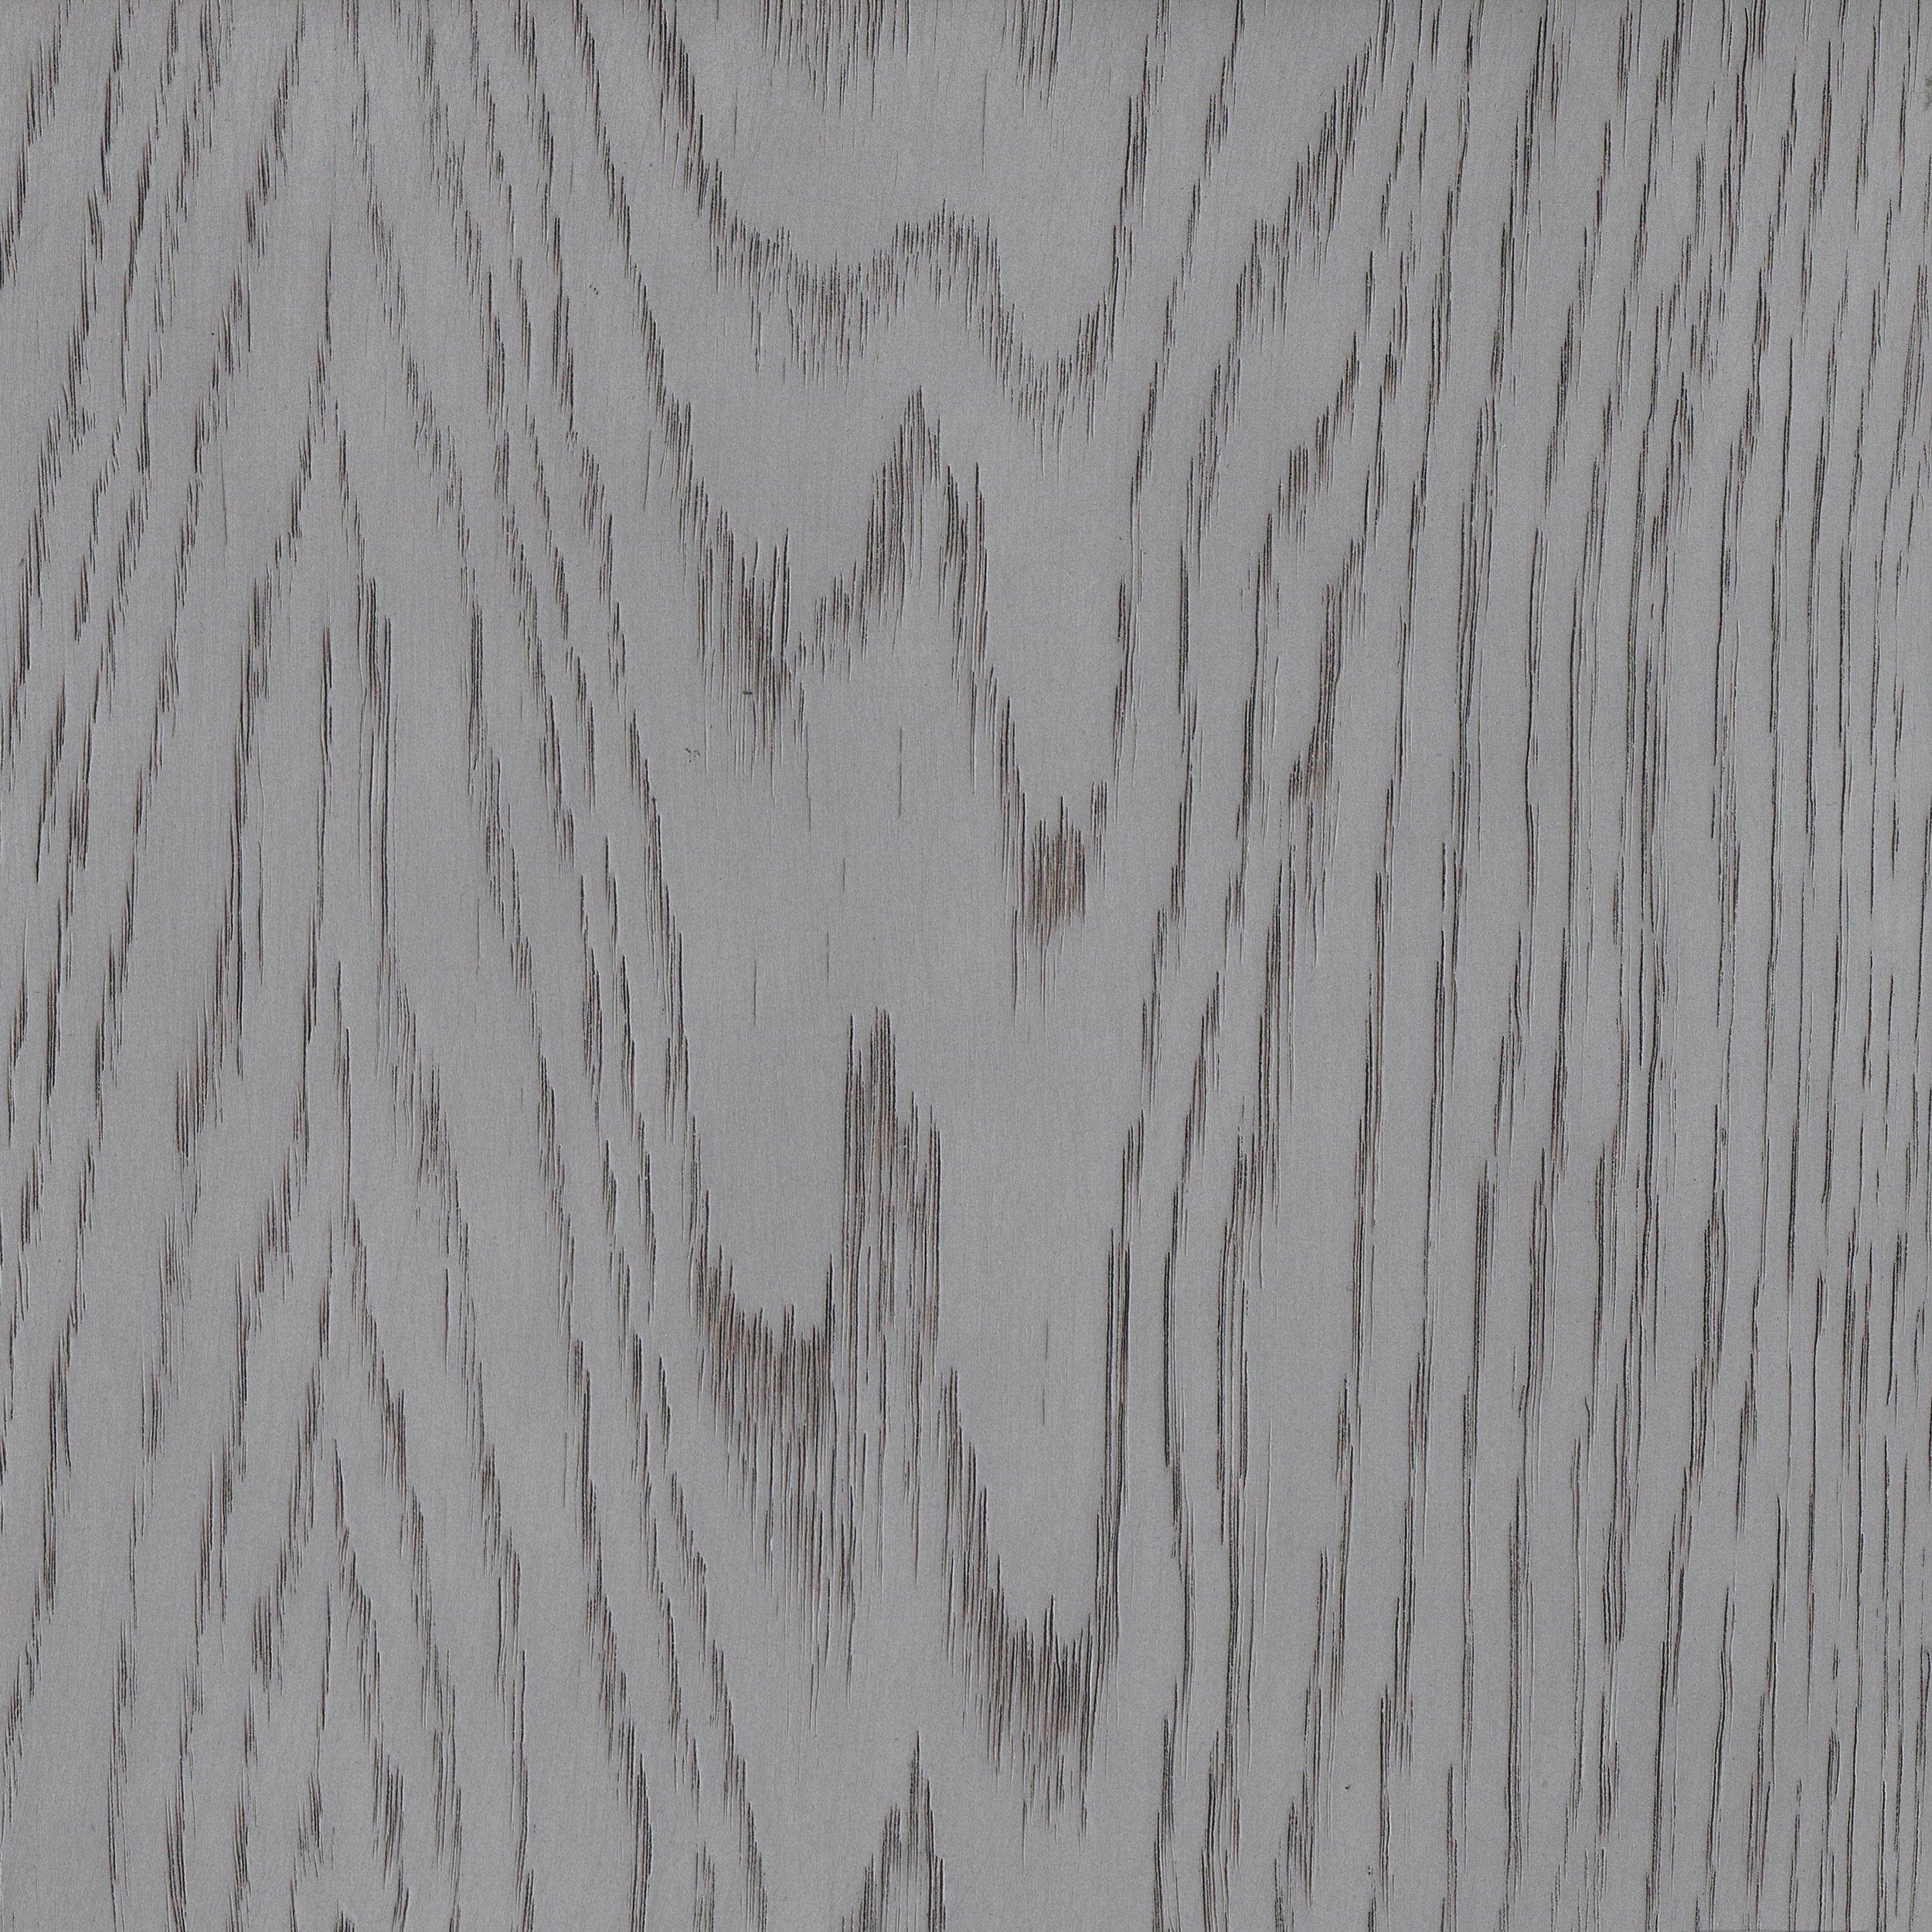 WD-6 Cerused Light Grey Oak